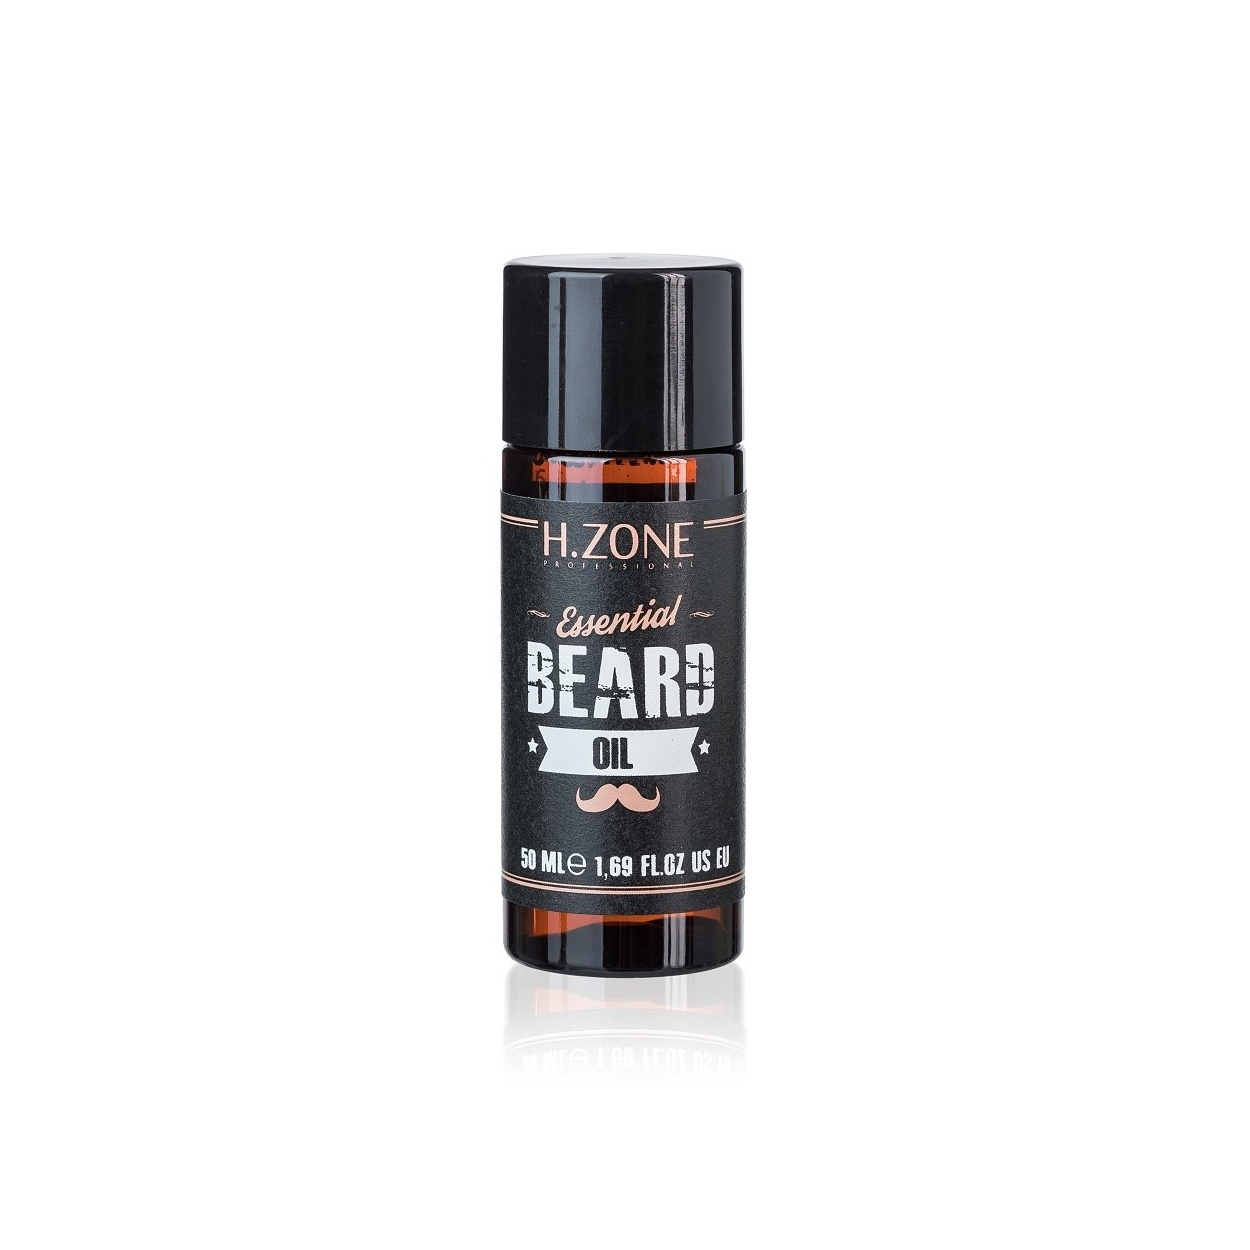 H.ZONE Essential beard oil